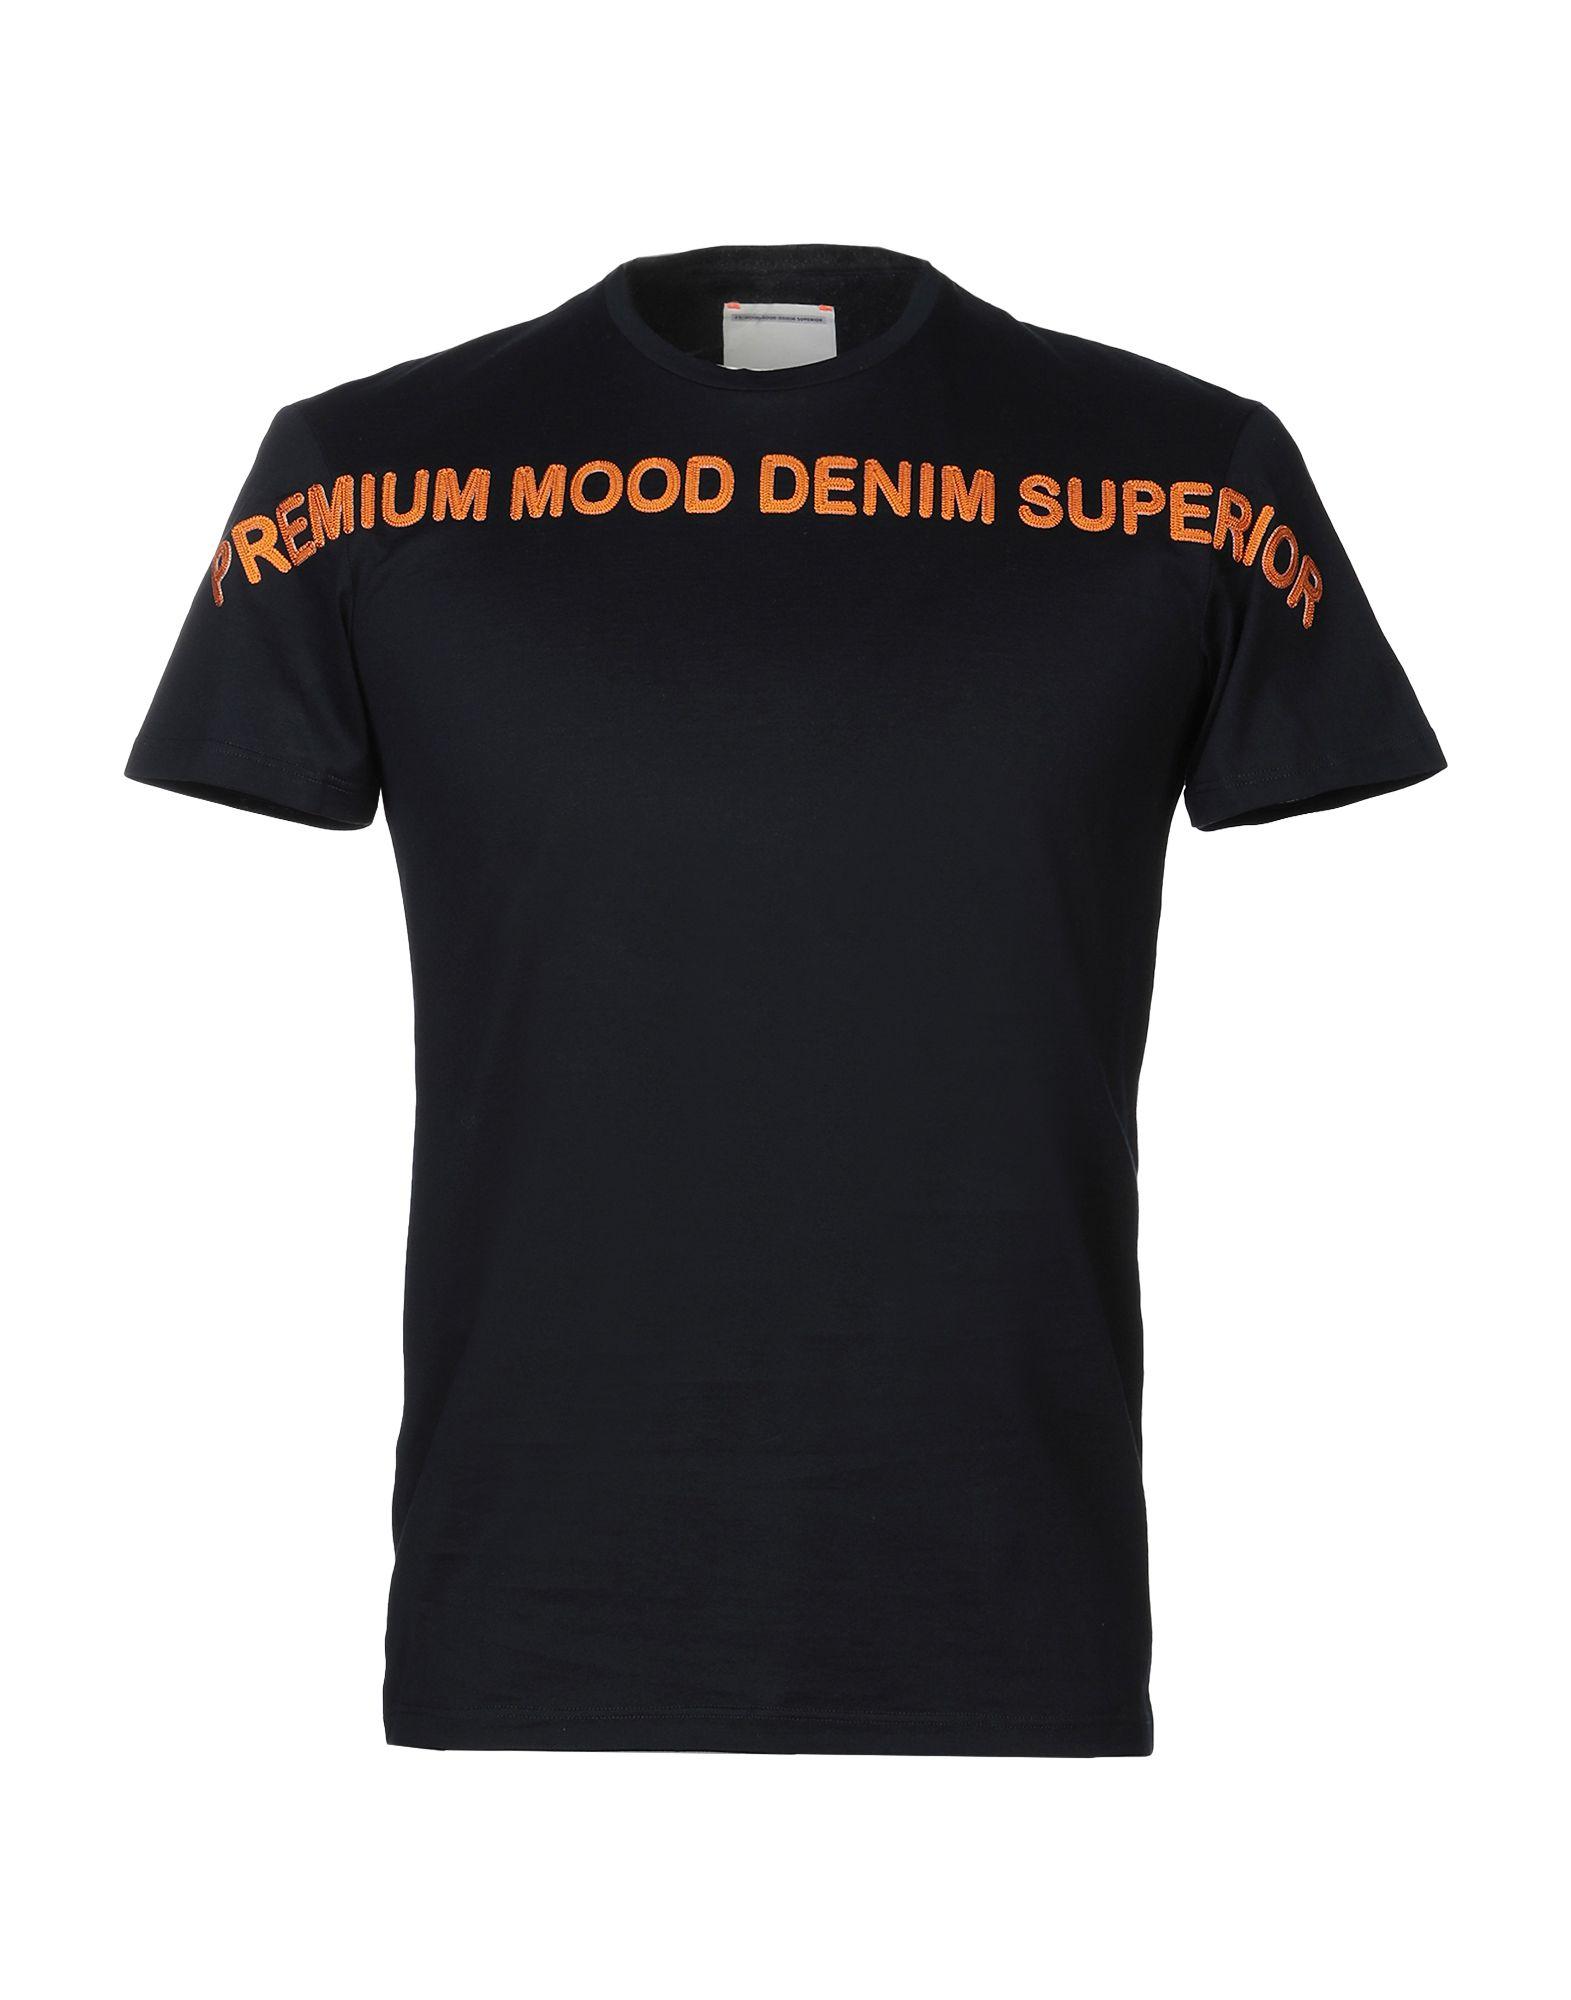 PMDS PREMIUM MOOD DENIM SUPERIOR Футболка sv52 superior vintage толстовка